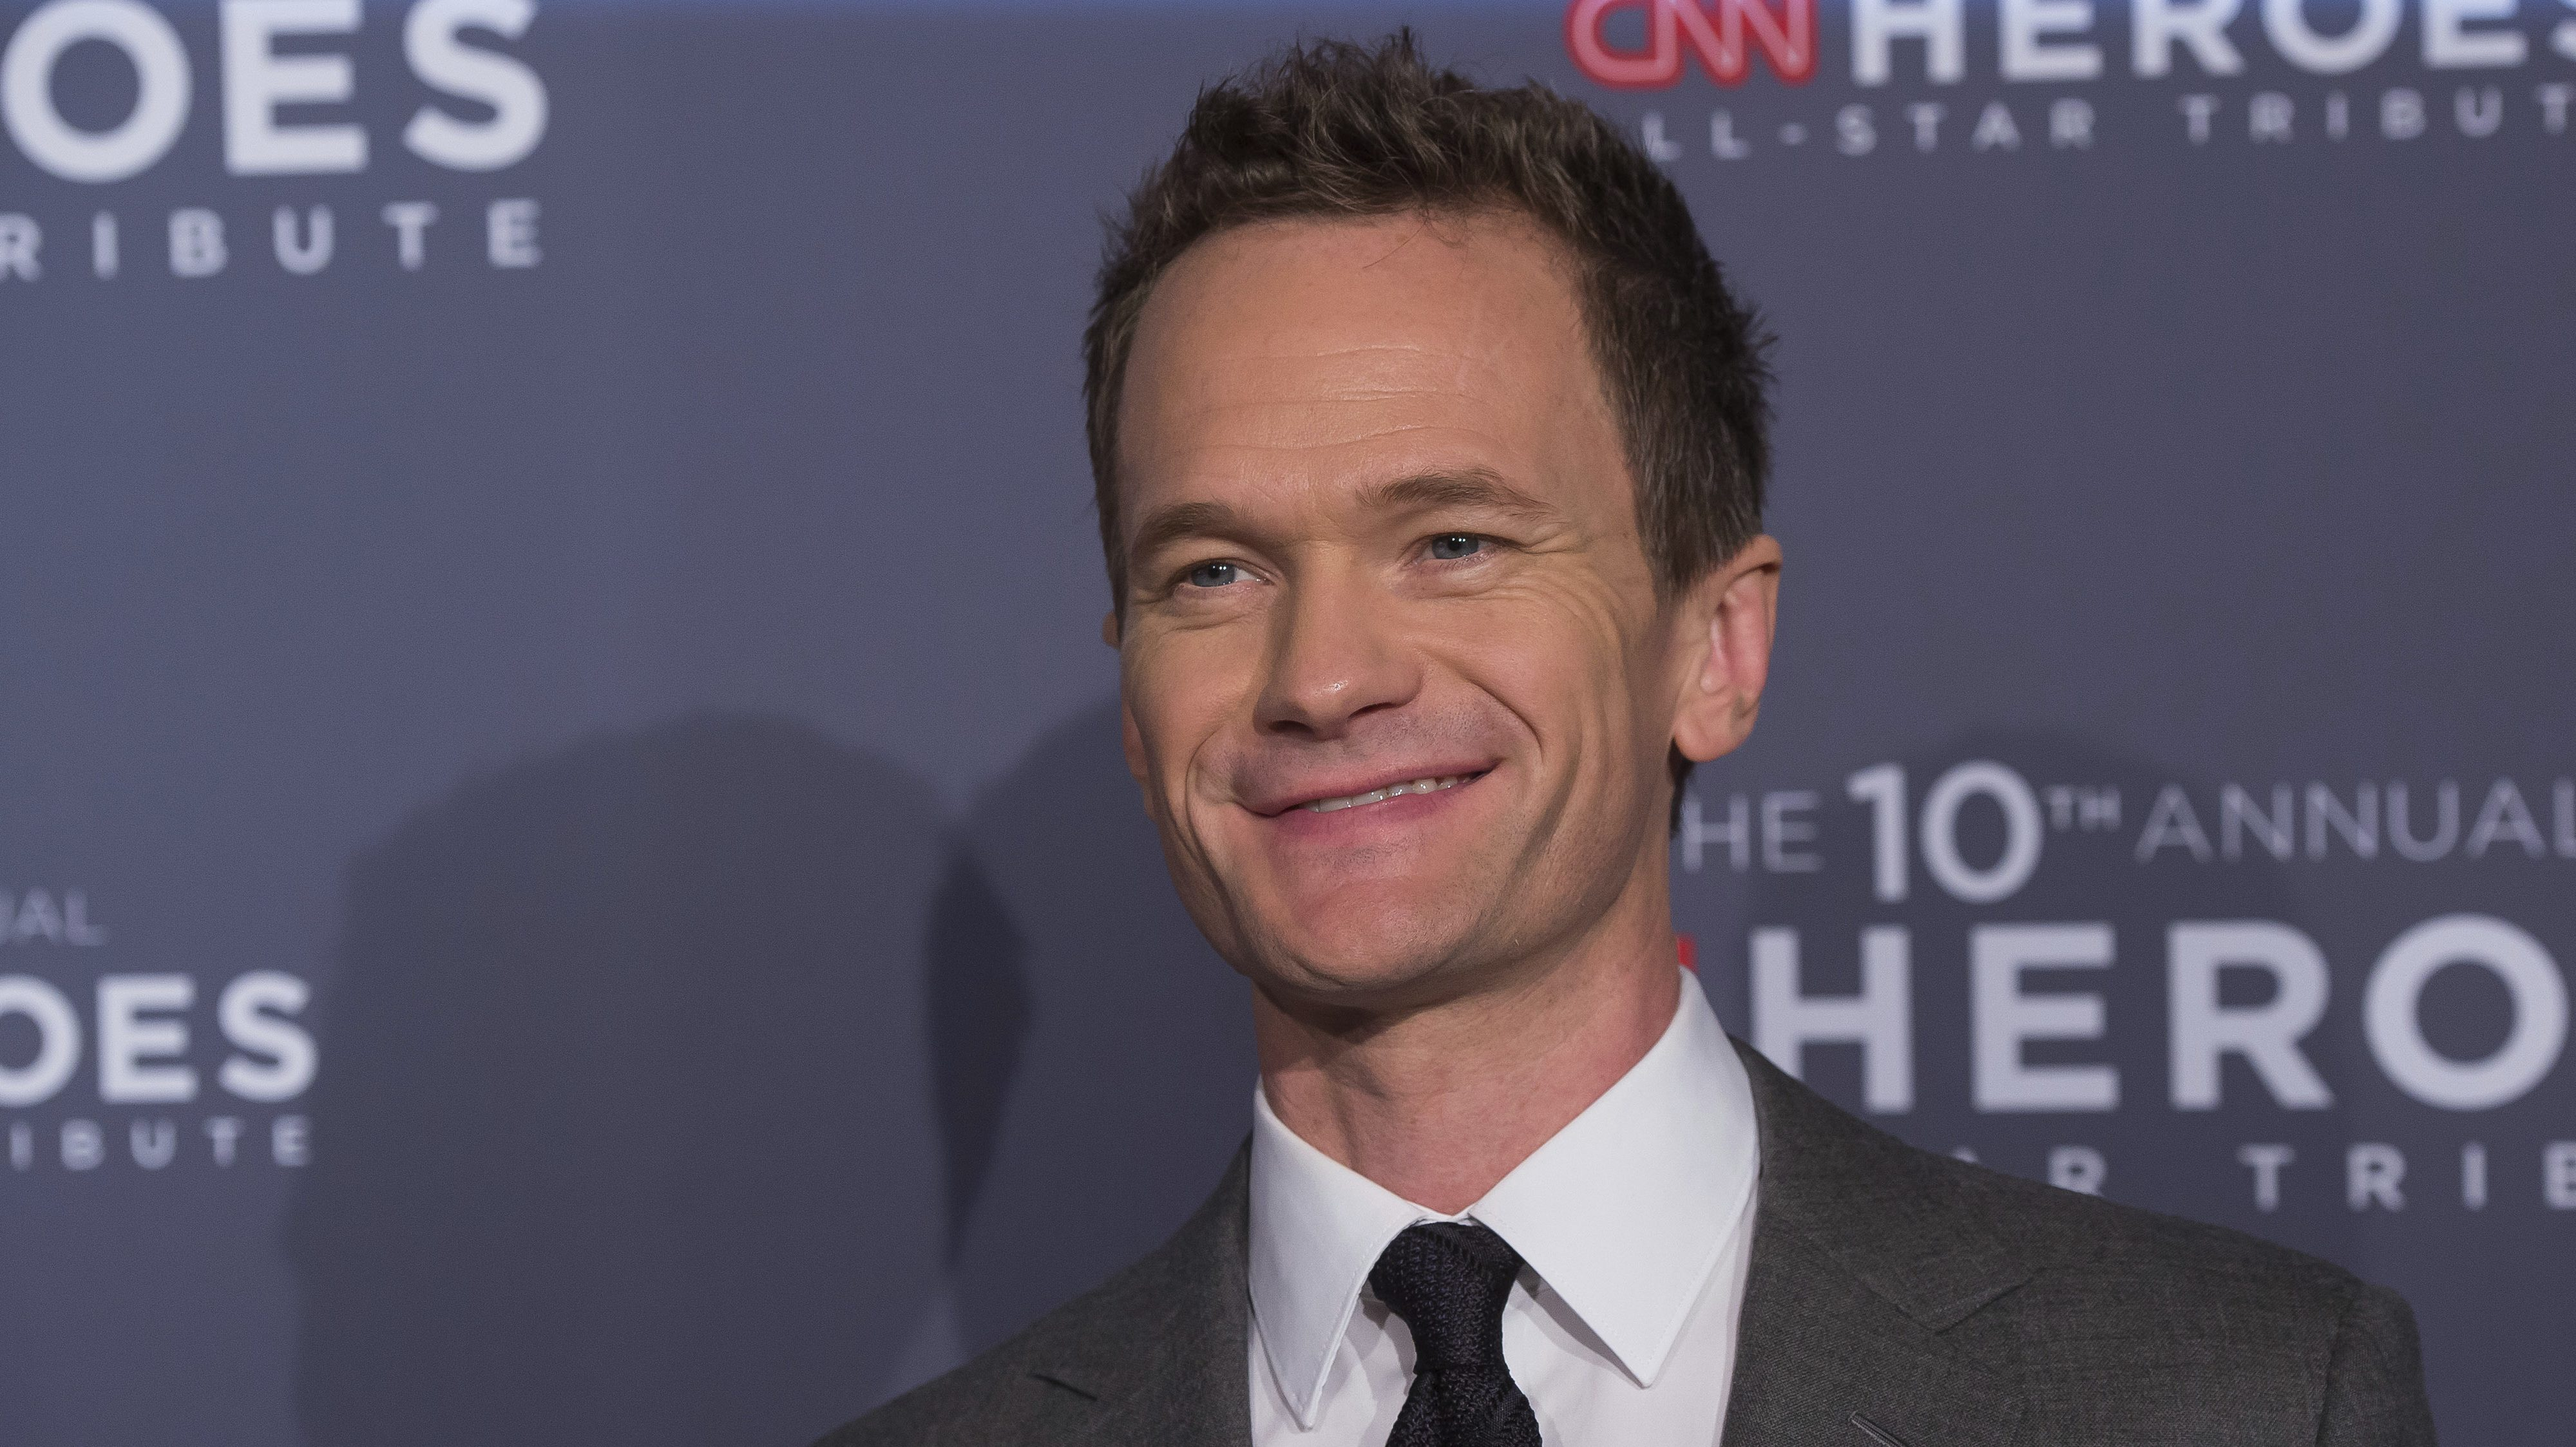 Neil Patrick Harris To Headline Darren Star's Netflix Comedy Series ' Uncoupled' – Deadline